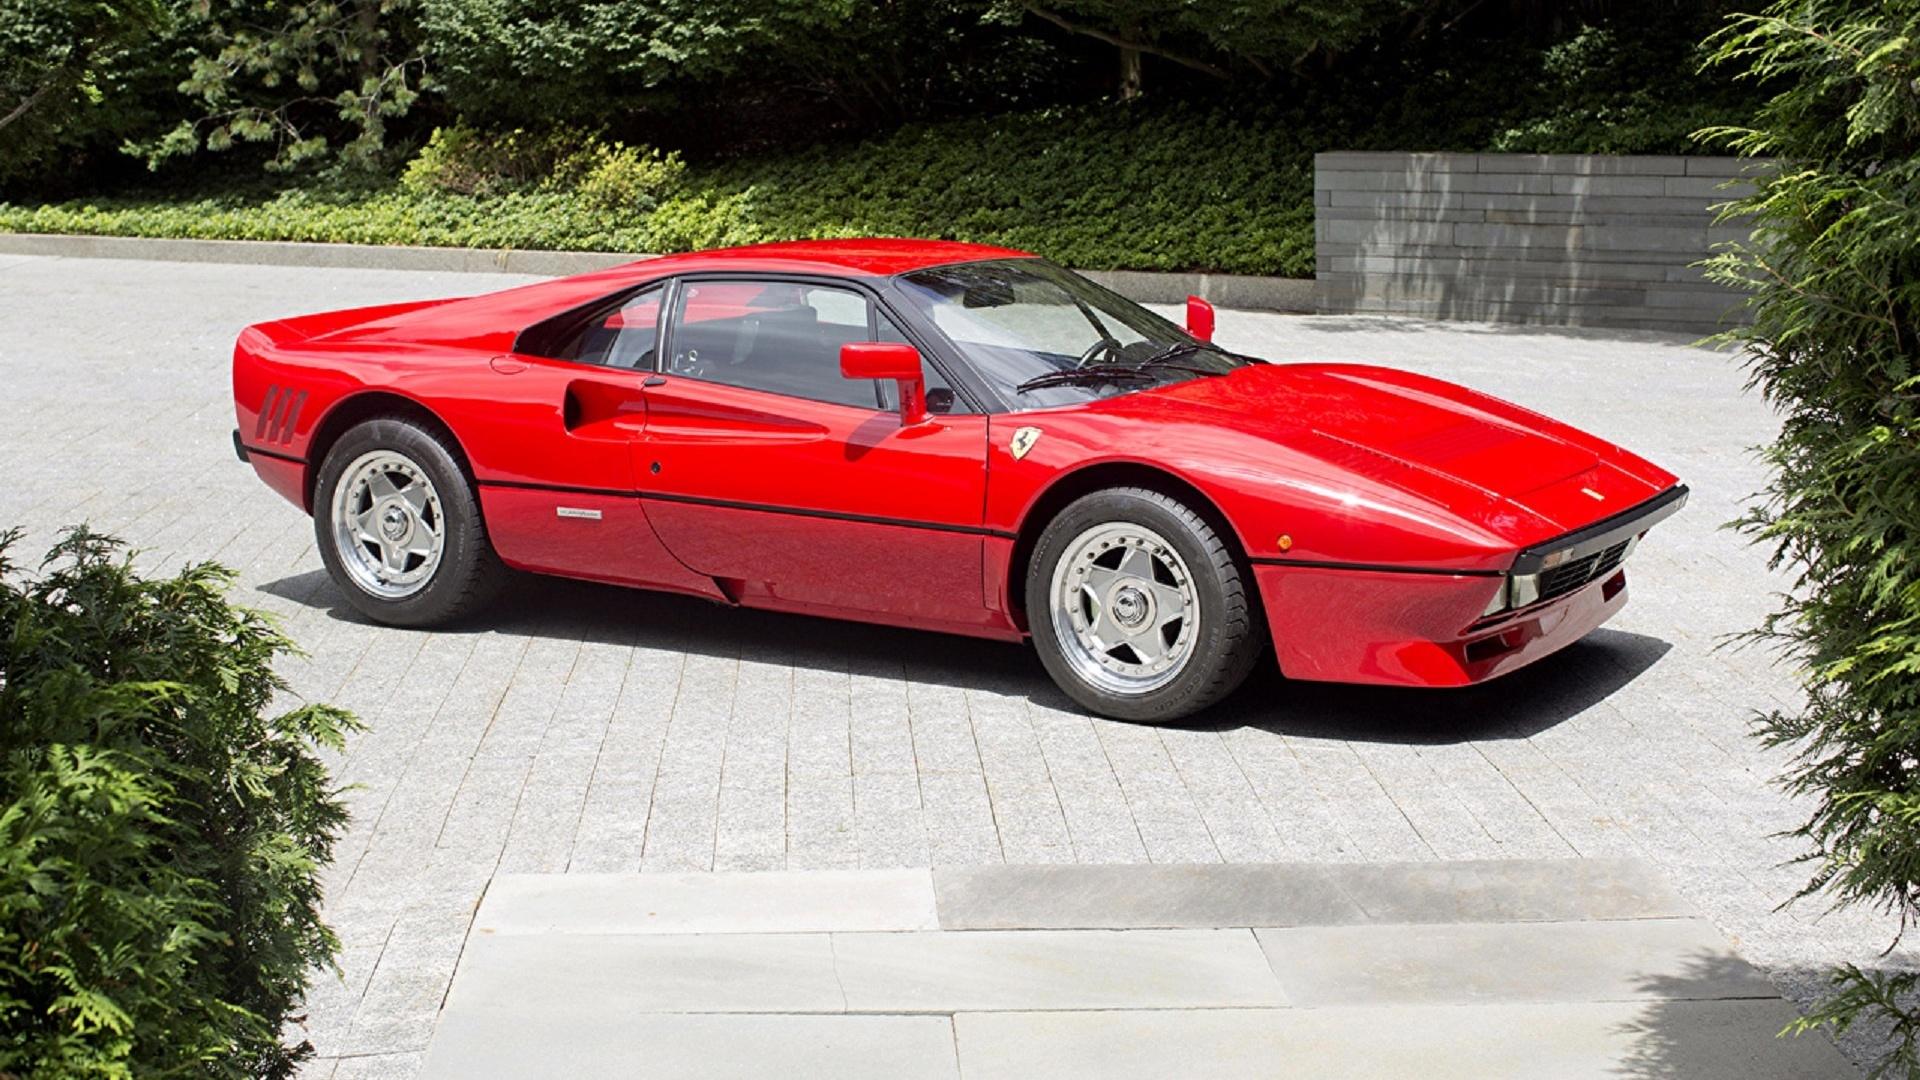 феррари, 1984-85, спорткар, красный